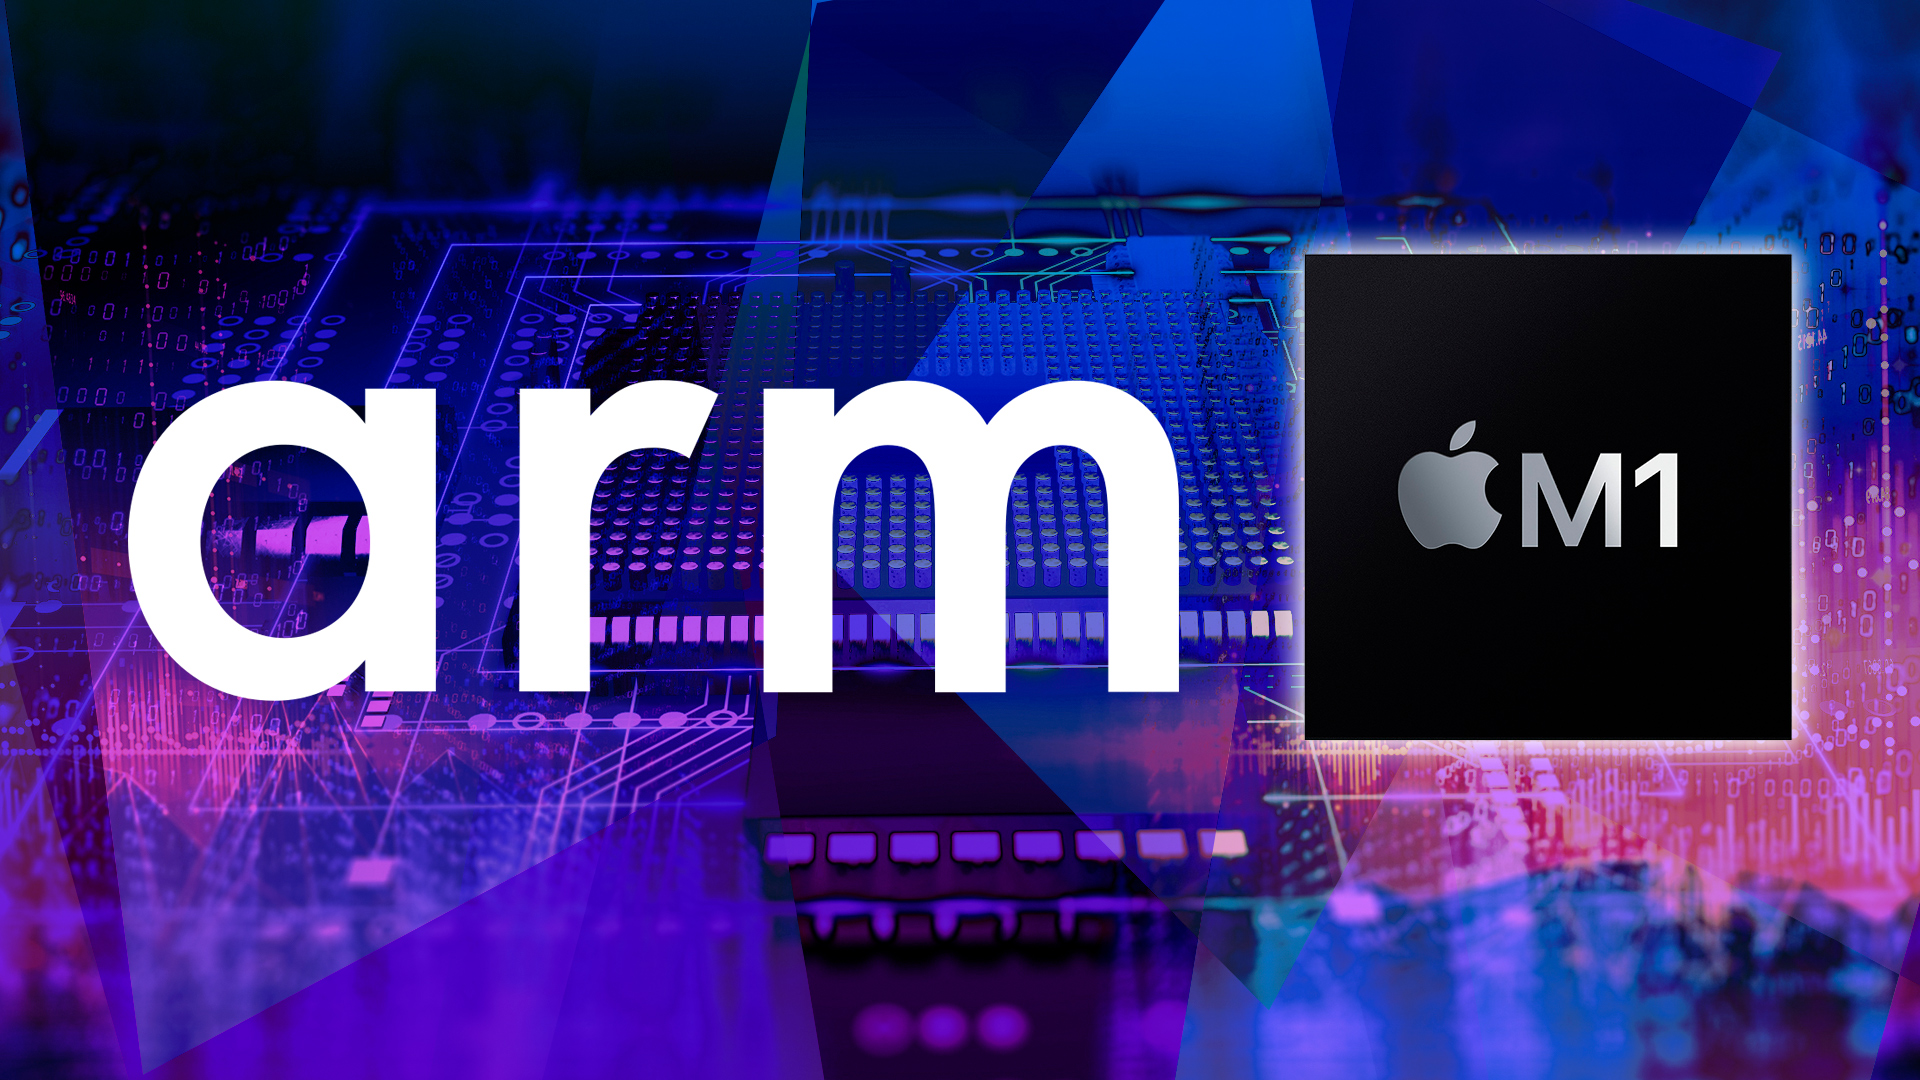 Apple, Logo, Prozessor, Cpu, Chip, Arm, SoC, Prozessoren, Mainboard, M1, Apple Logo, Apple M1, Motherboard, Platine, Apple Chip, Apple M1 Chip, M1 Chip, Apple ARM, M1 Arm, Arm Chip, Apple Arm Chip